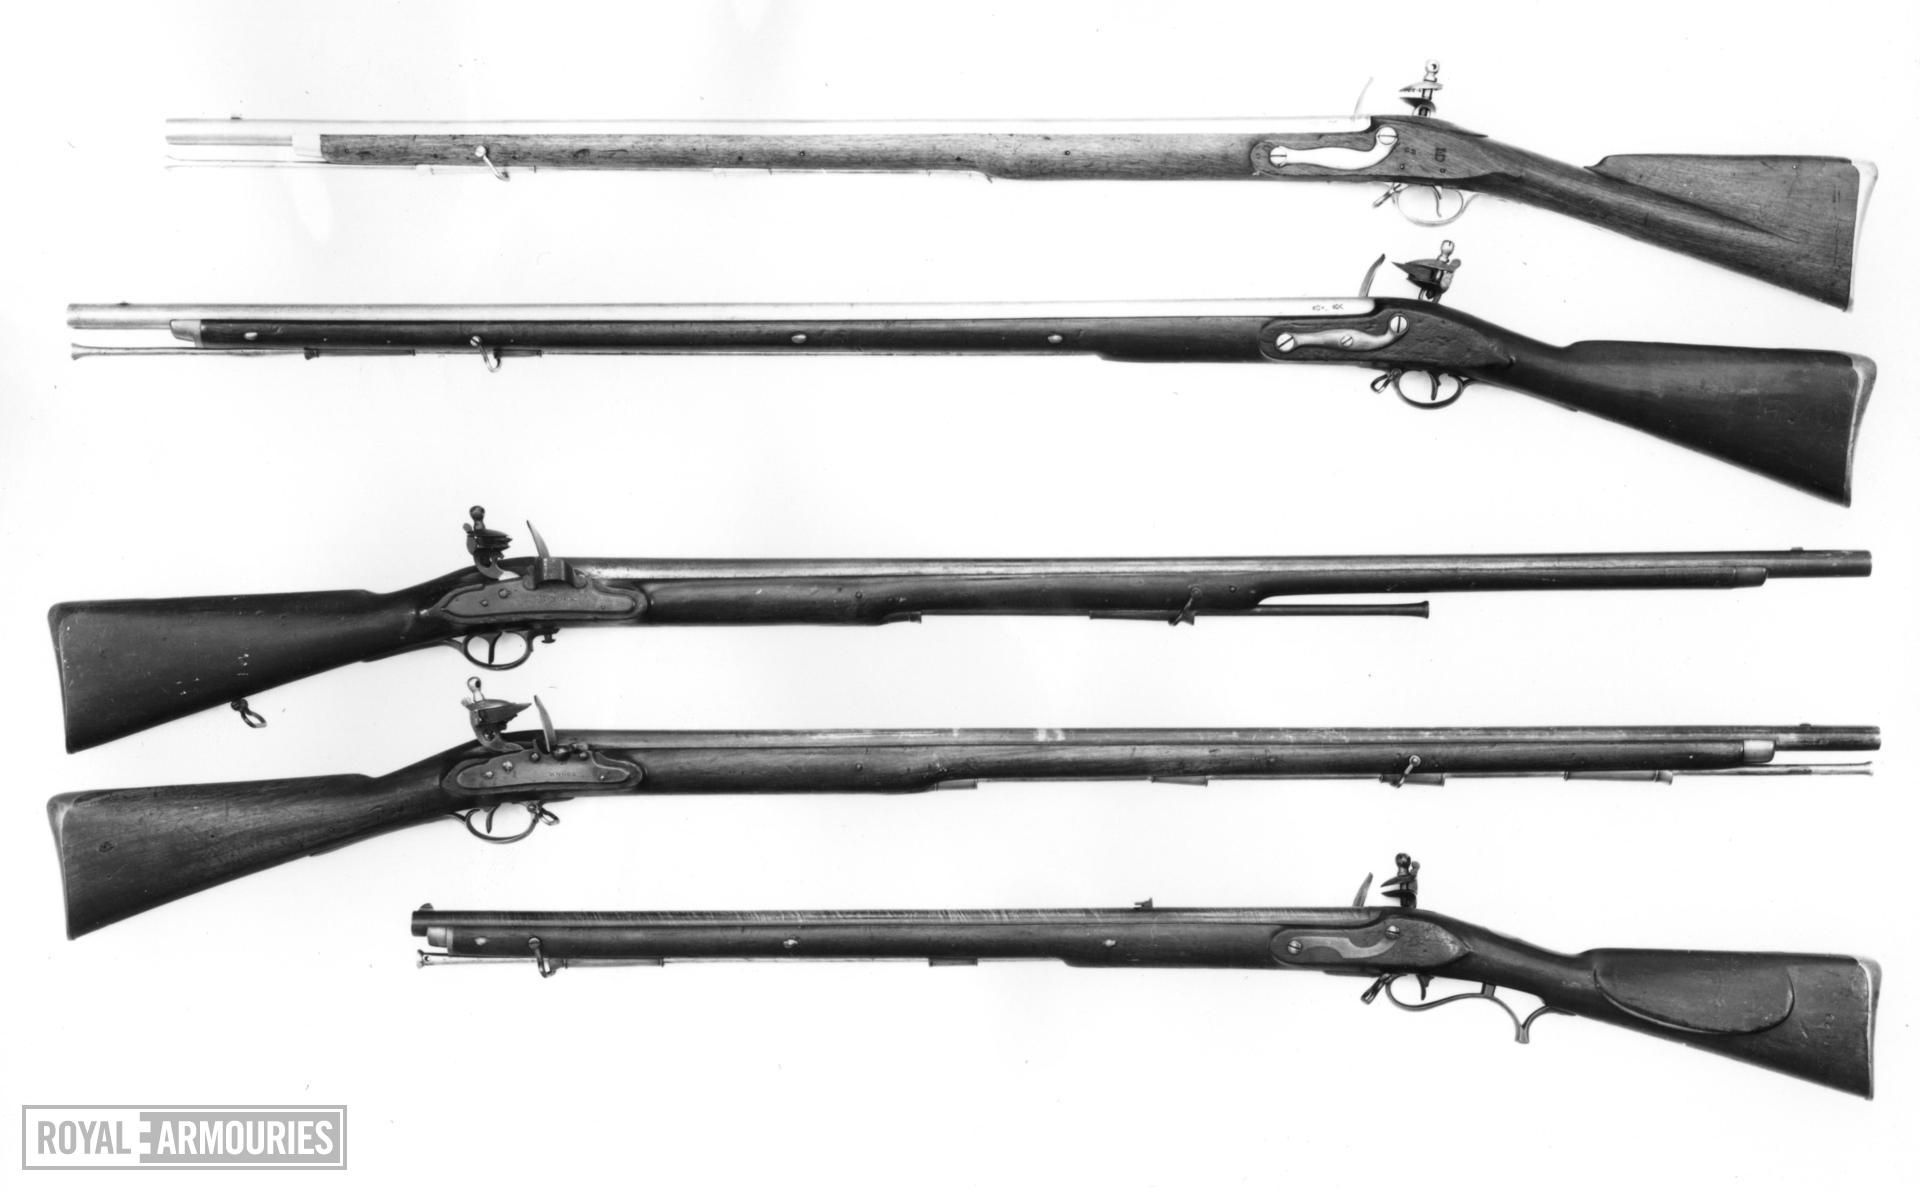 Flintlock muzzle-loading military musket - Duke of Richmond's 2nd Model